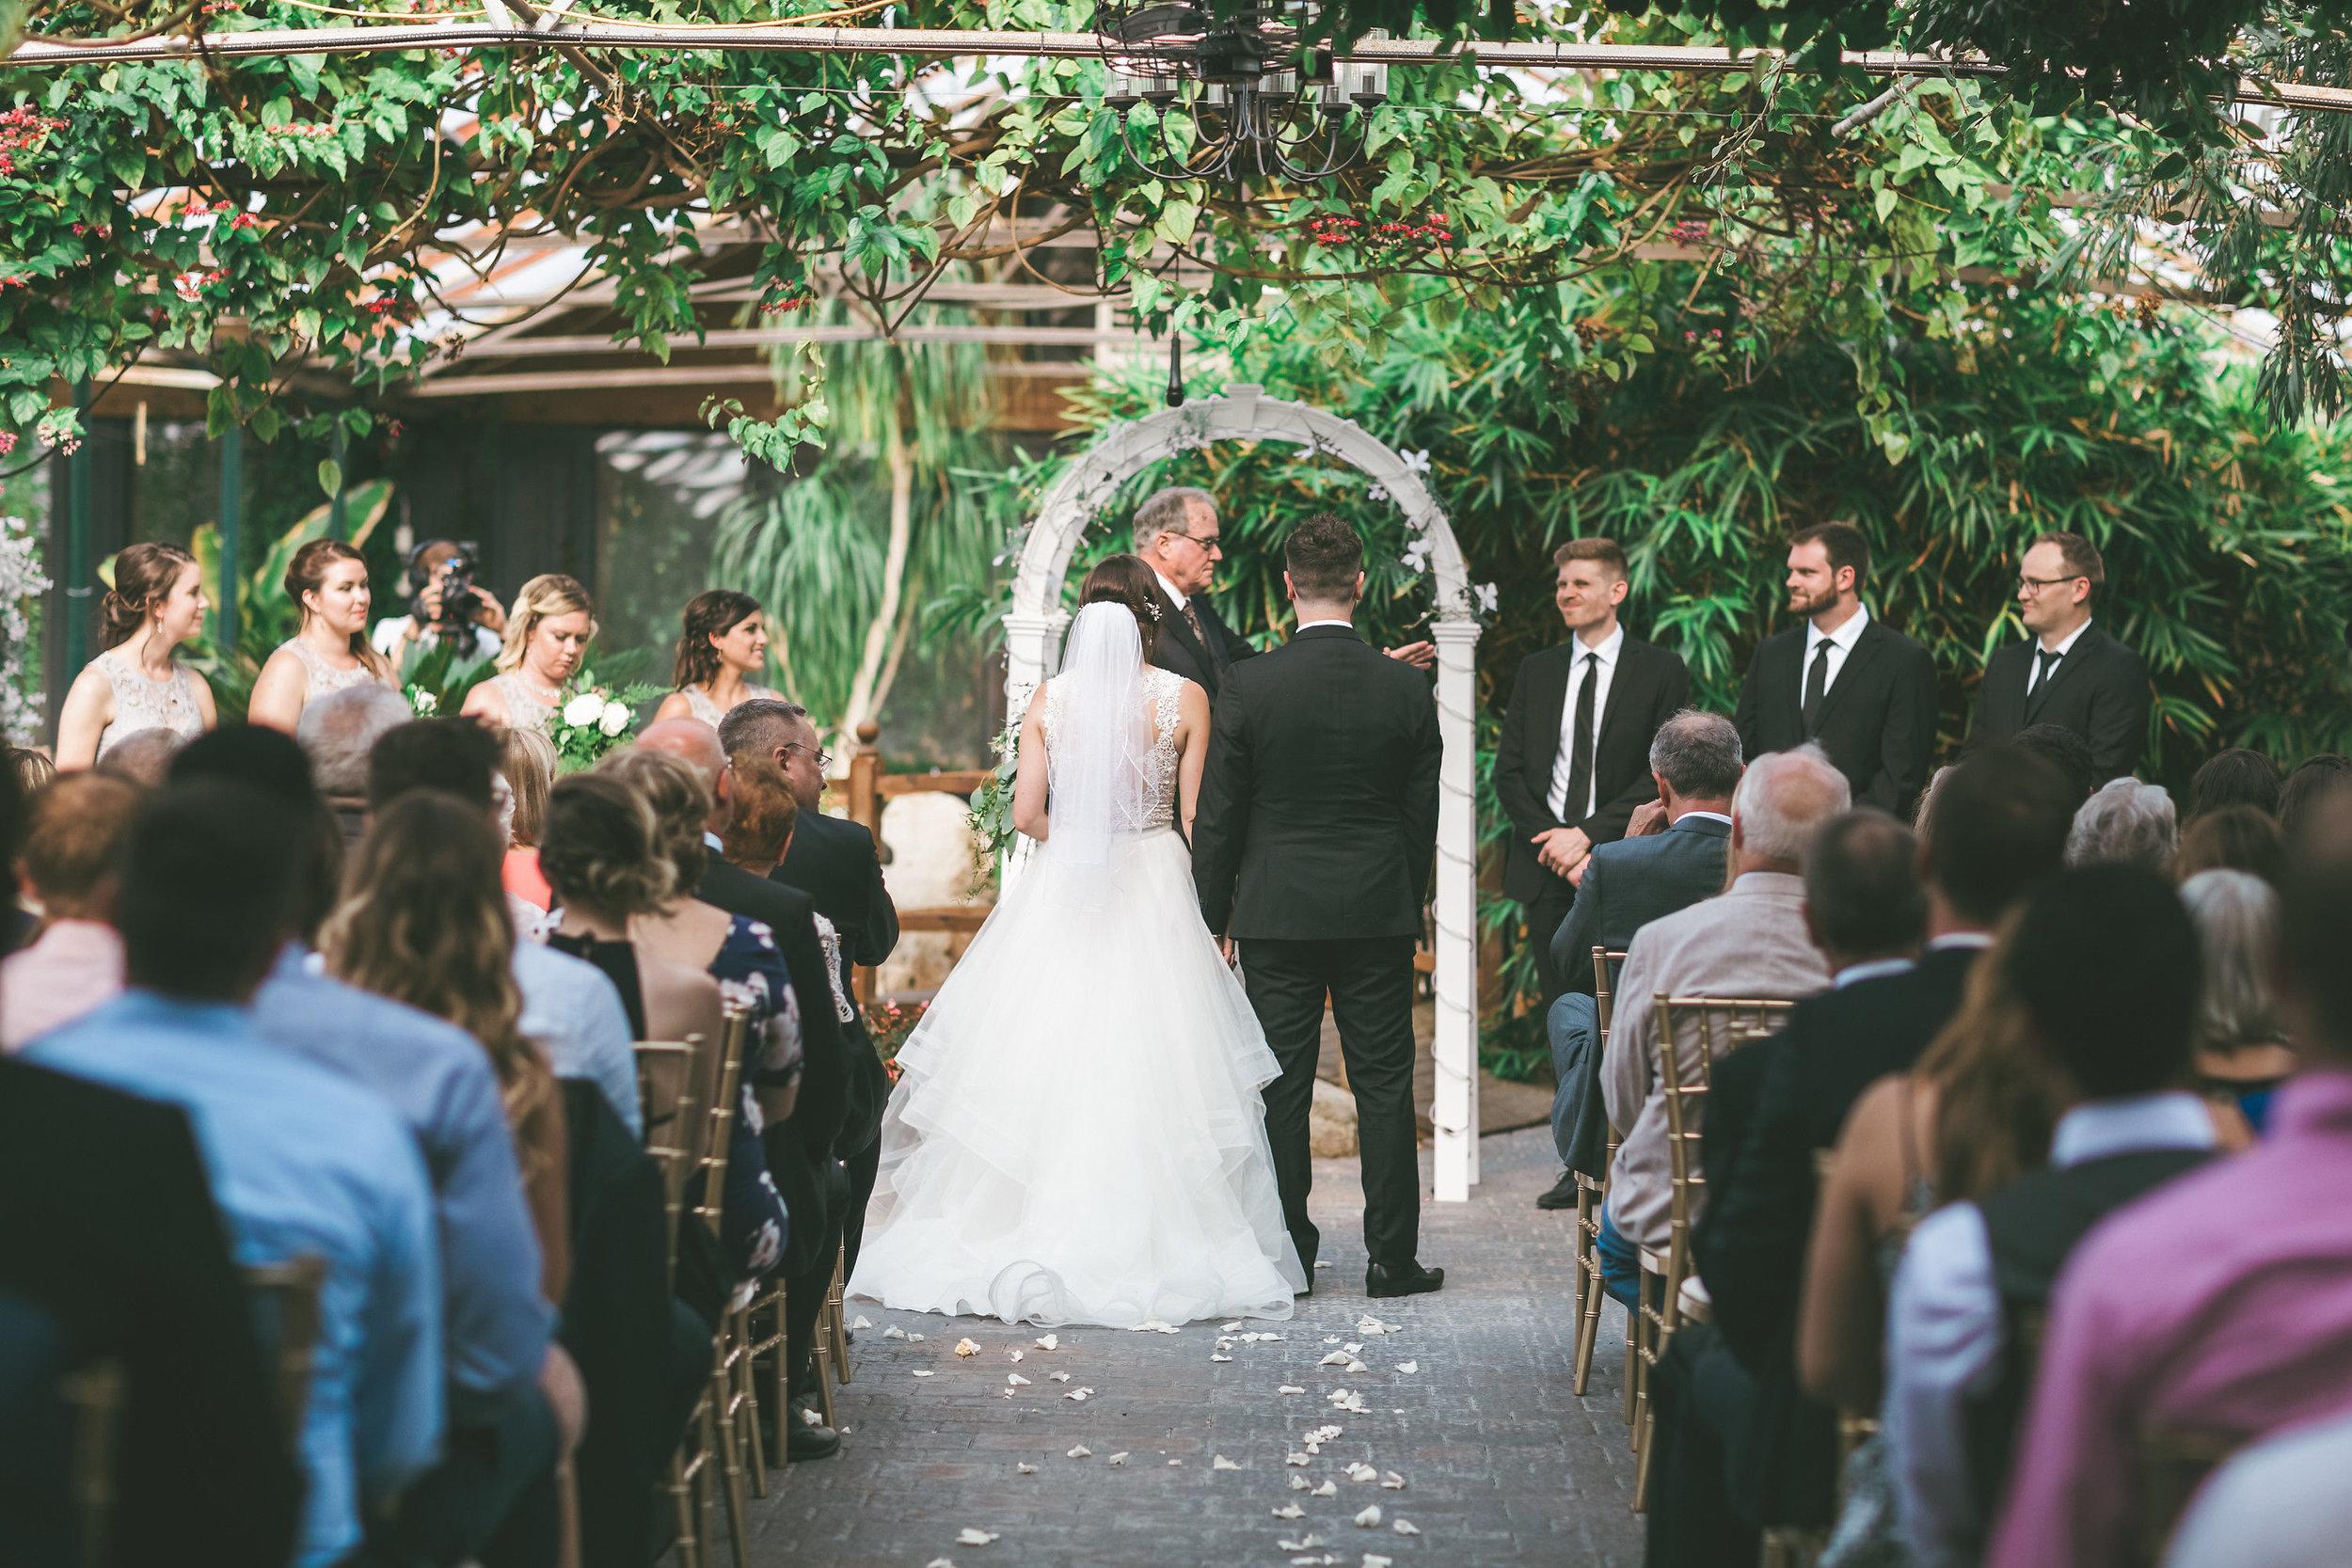 gosia___mike_wedding___lifesreel_danielcaruso___0664.jpg